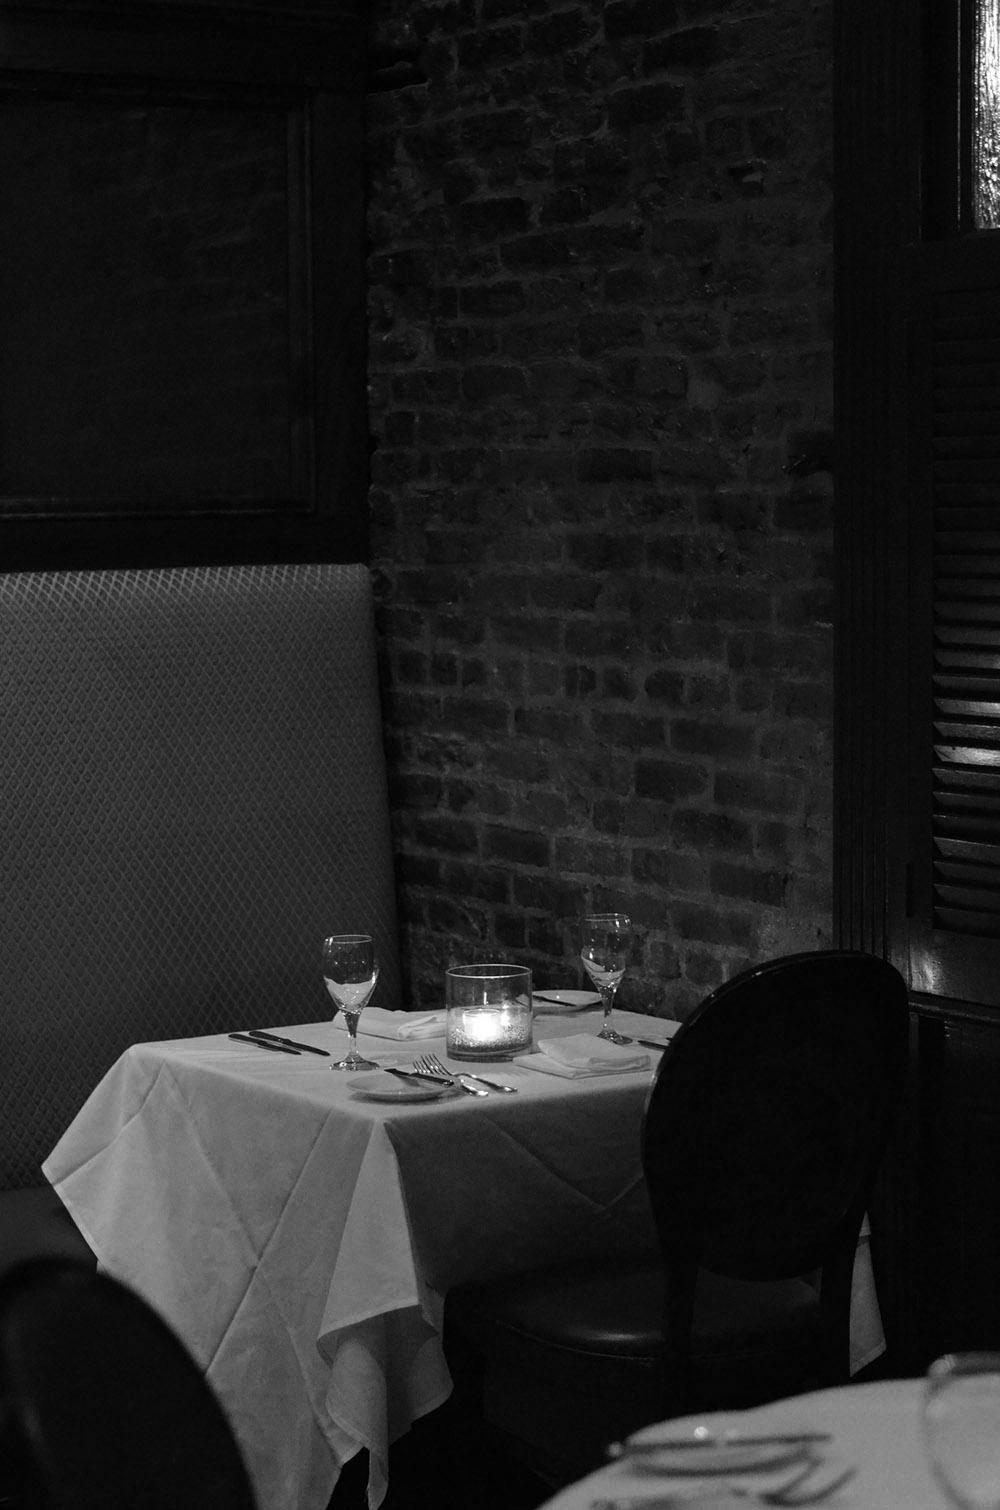 Restaurant August, New Orleans